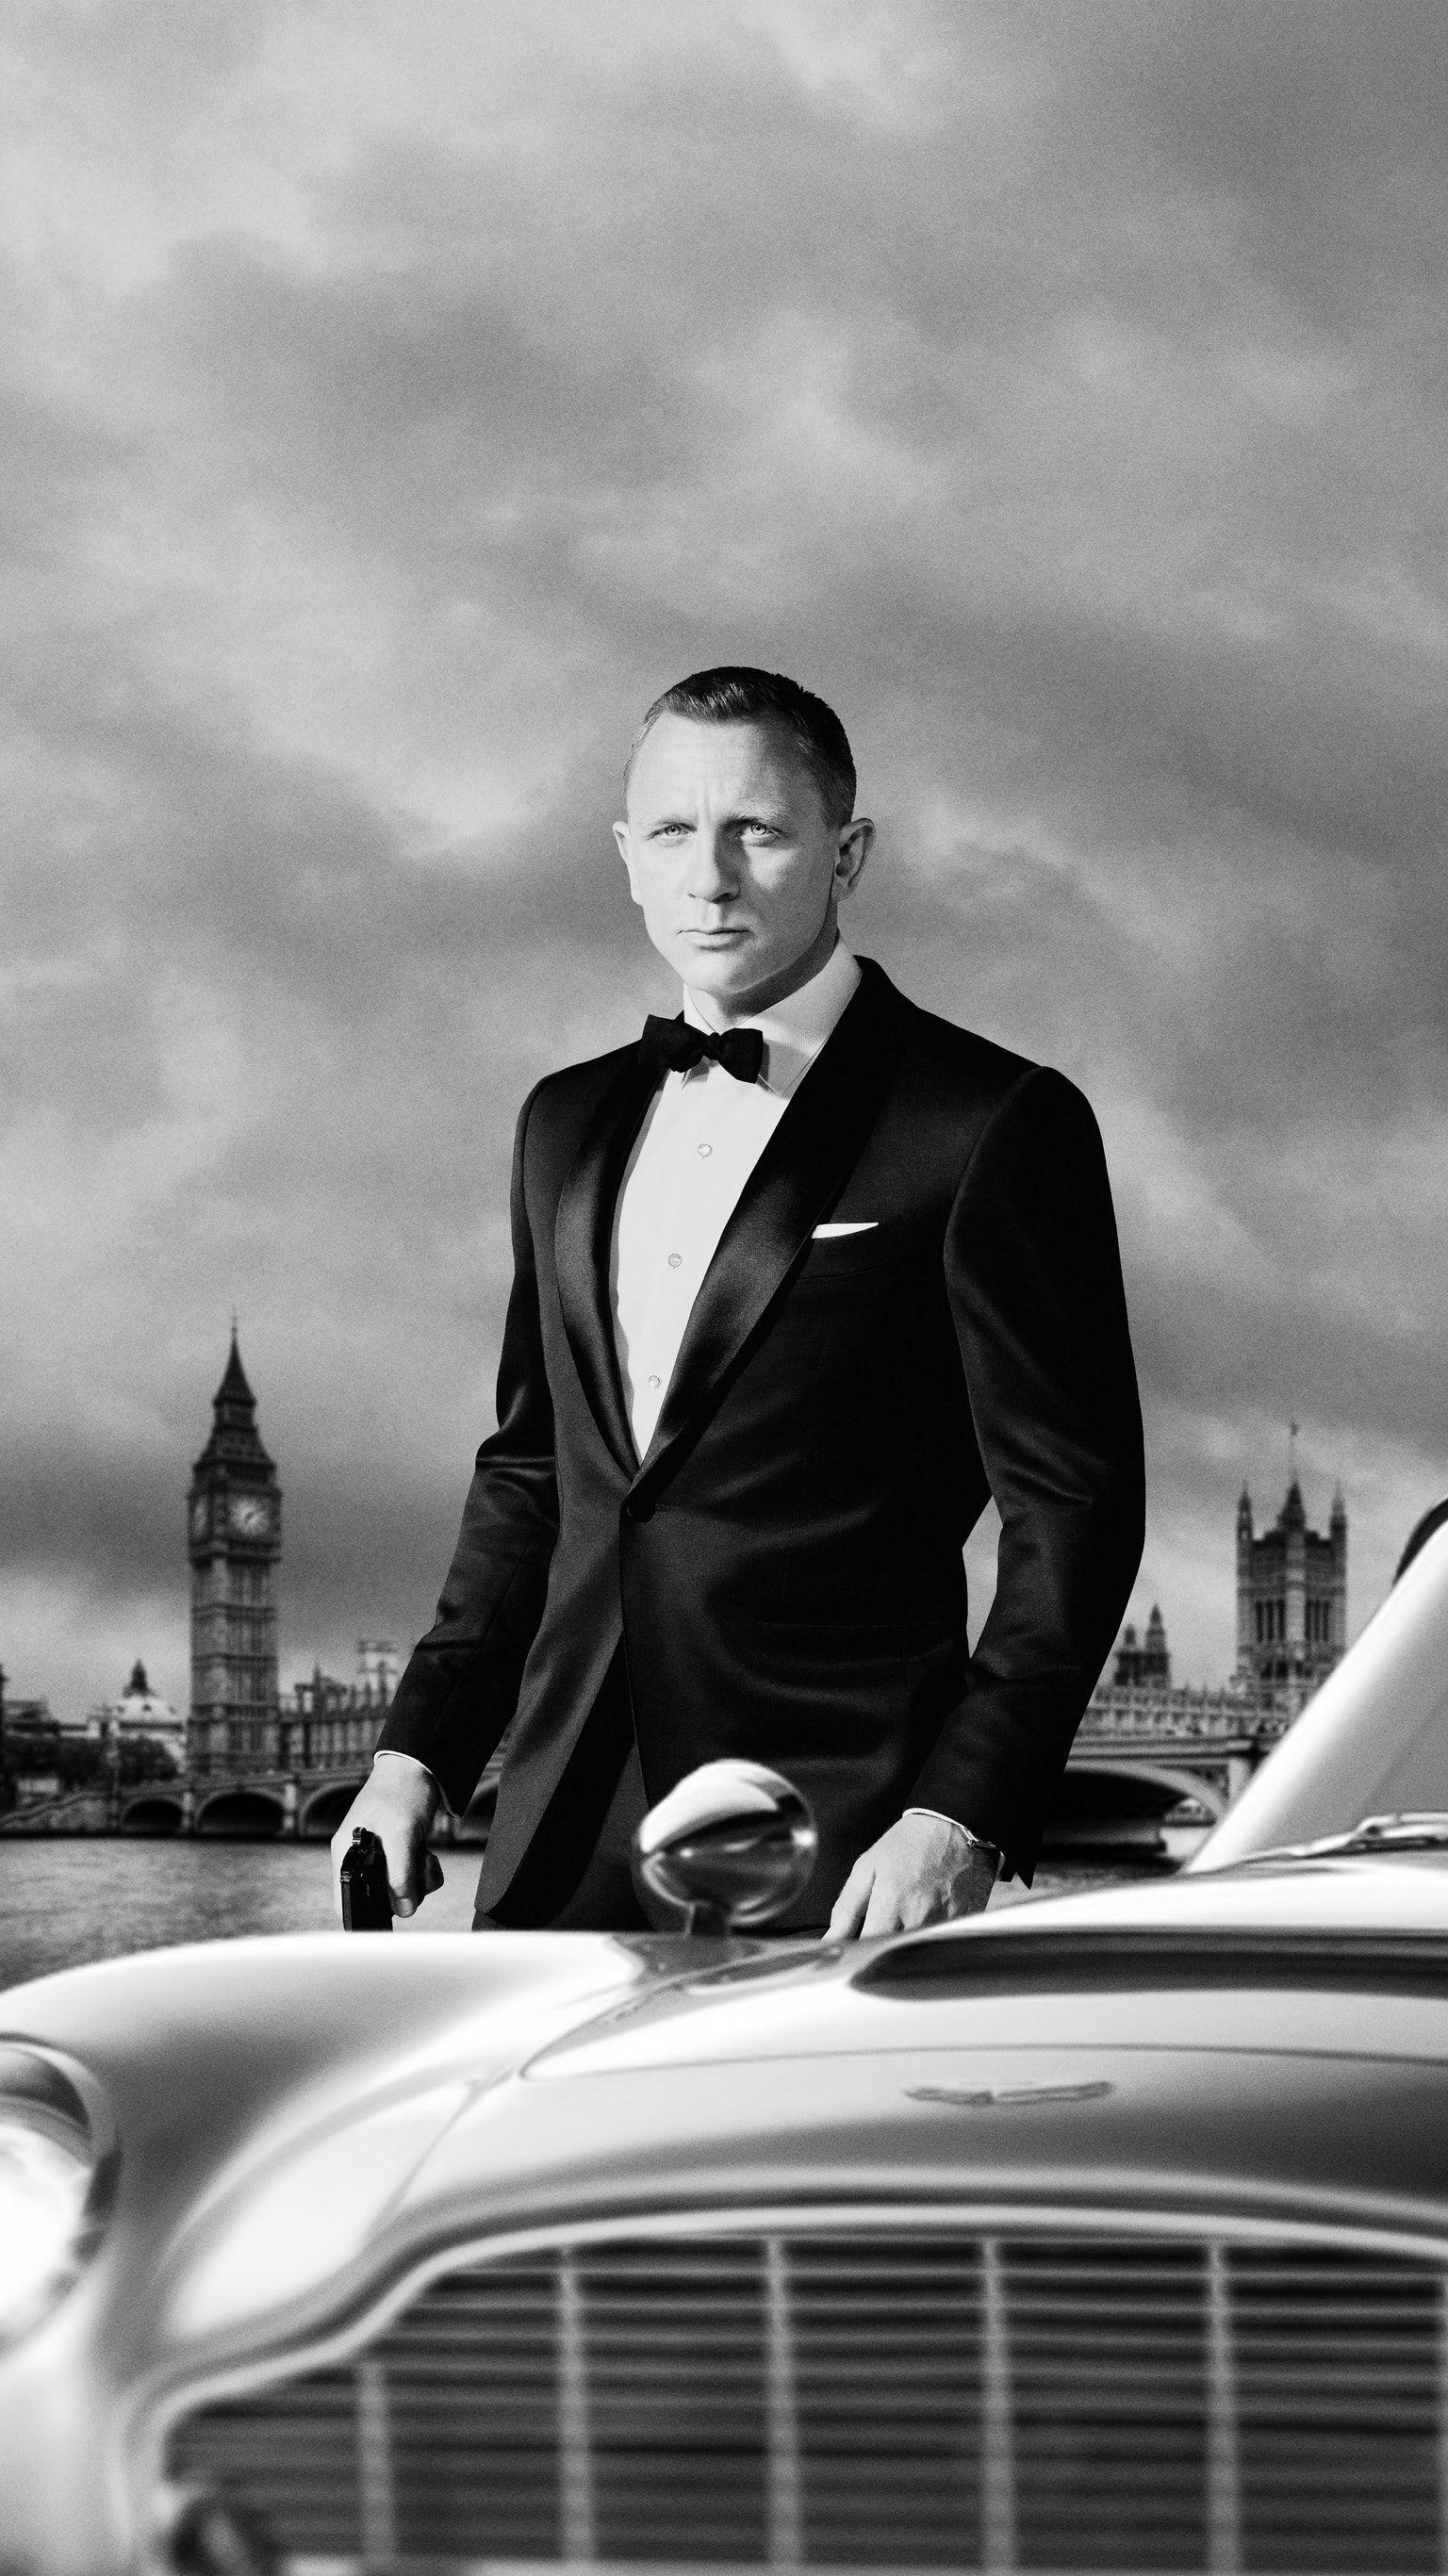 Skyfall 12 Phone Wallpaper Moviemania James Bond Movies Daniel Craig James Bond James Bond Skyfall